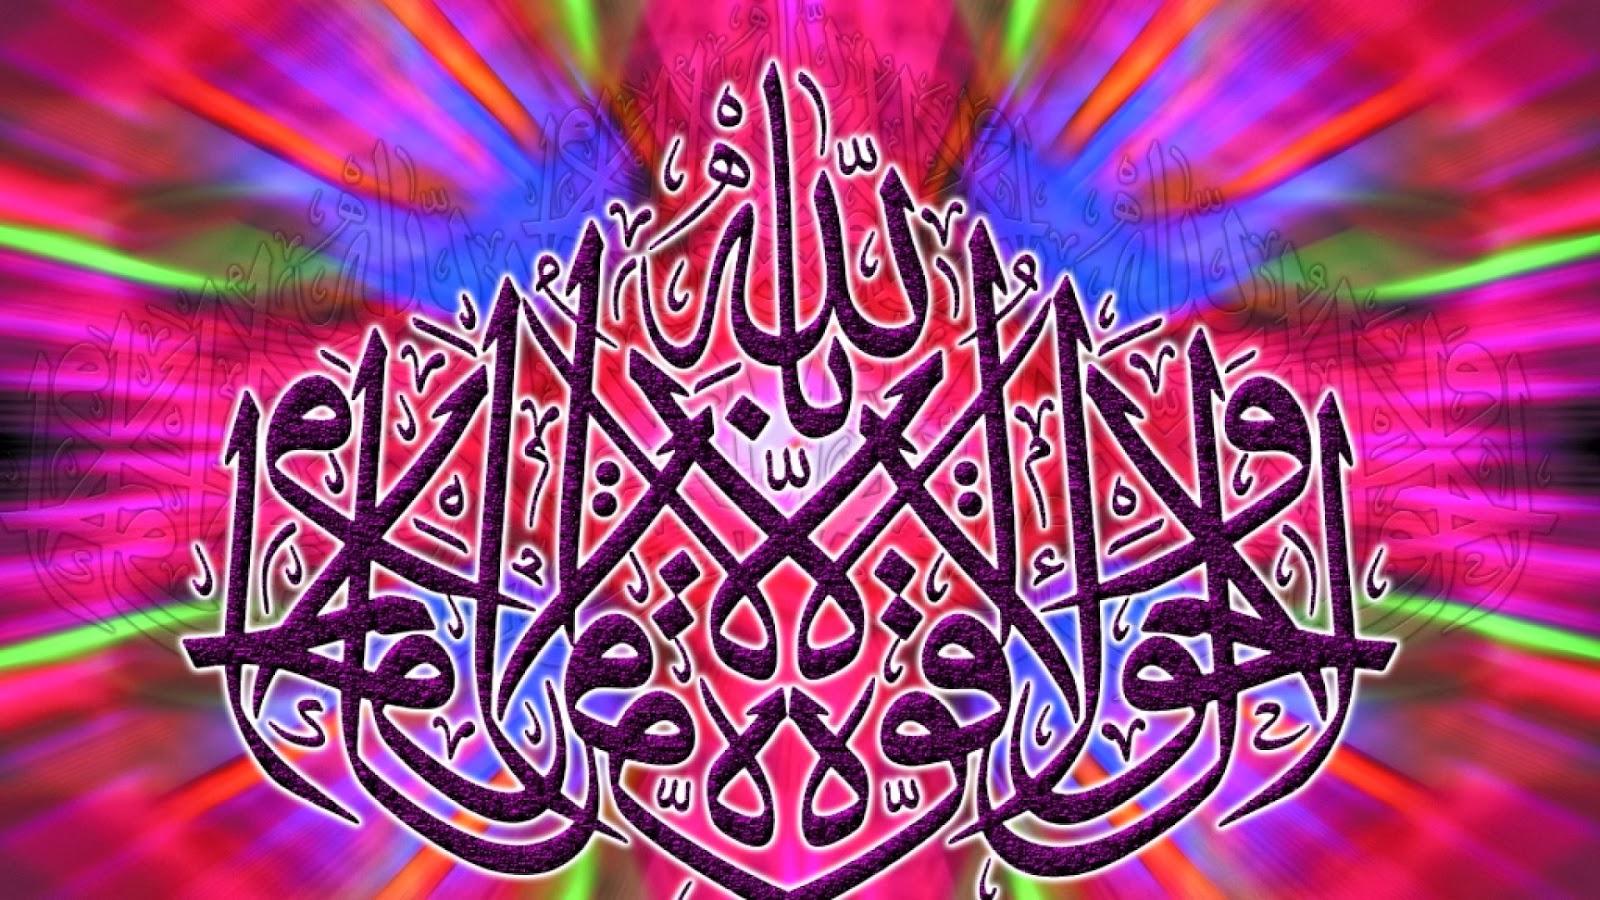 Ali 3d Name Wallpaper Free Download Islamic Hd Wallpaper Of Qurani Ayat Free Download Unique